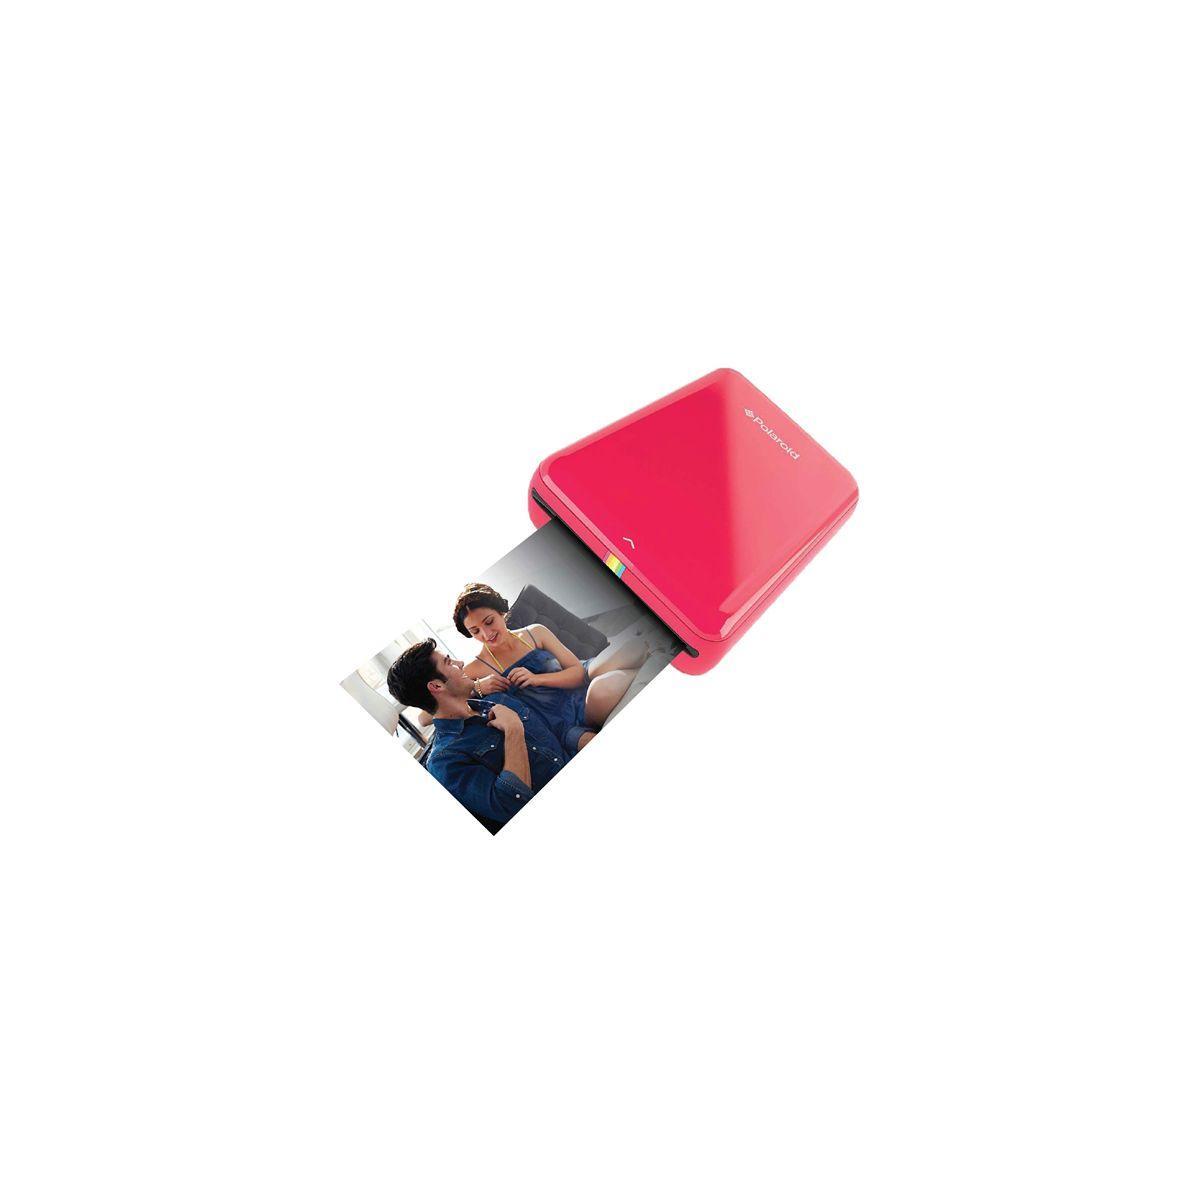 Imprimante photo polaroid mobile zip - rouge